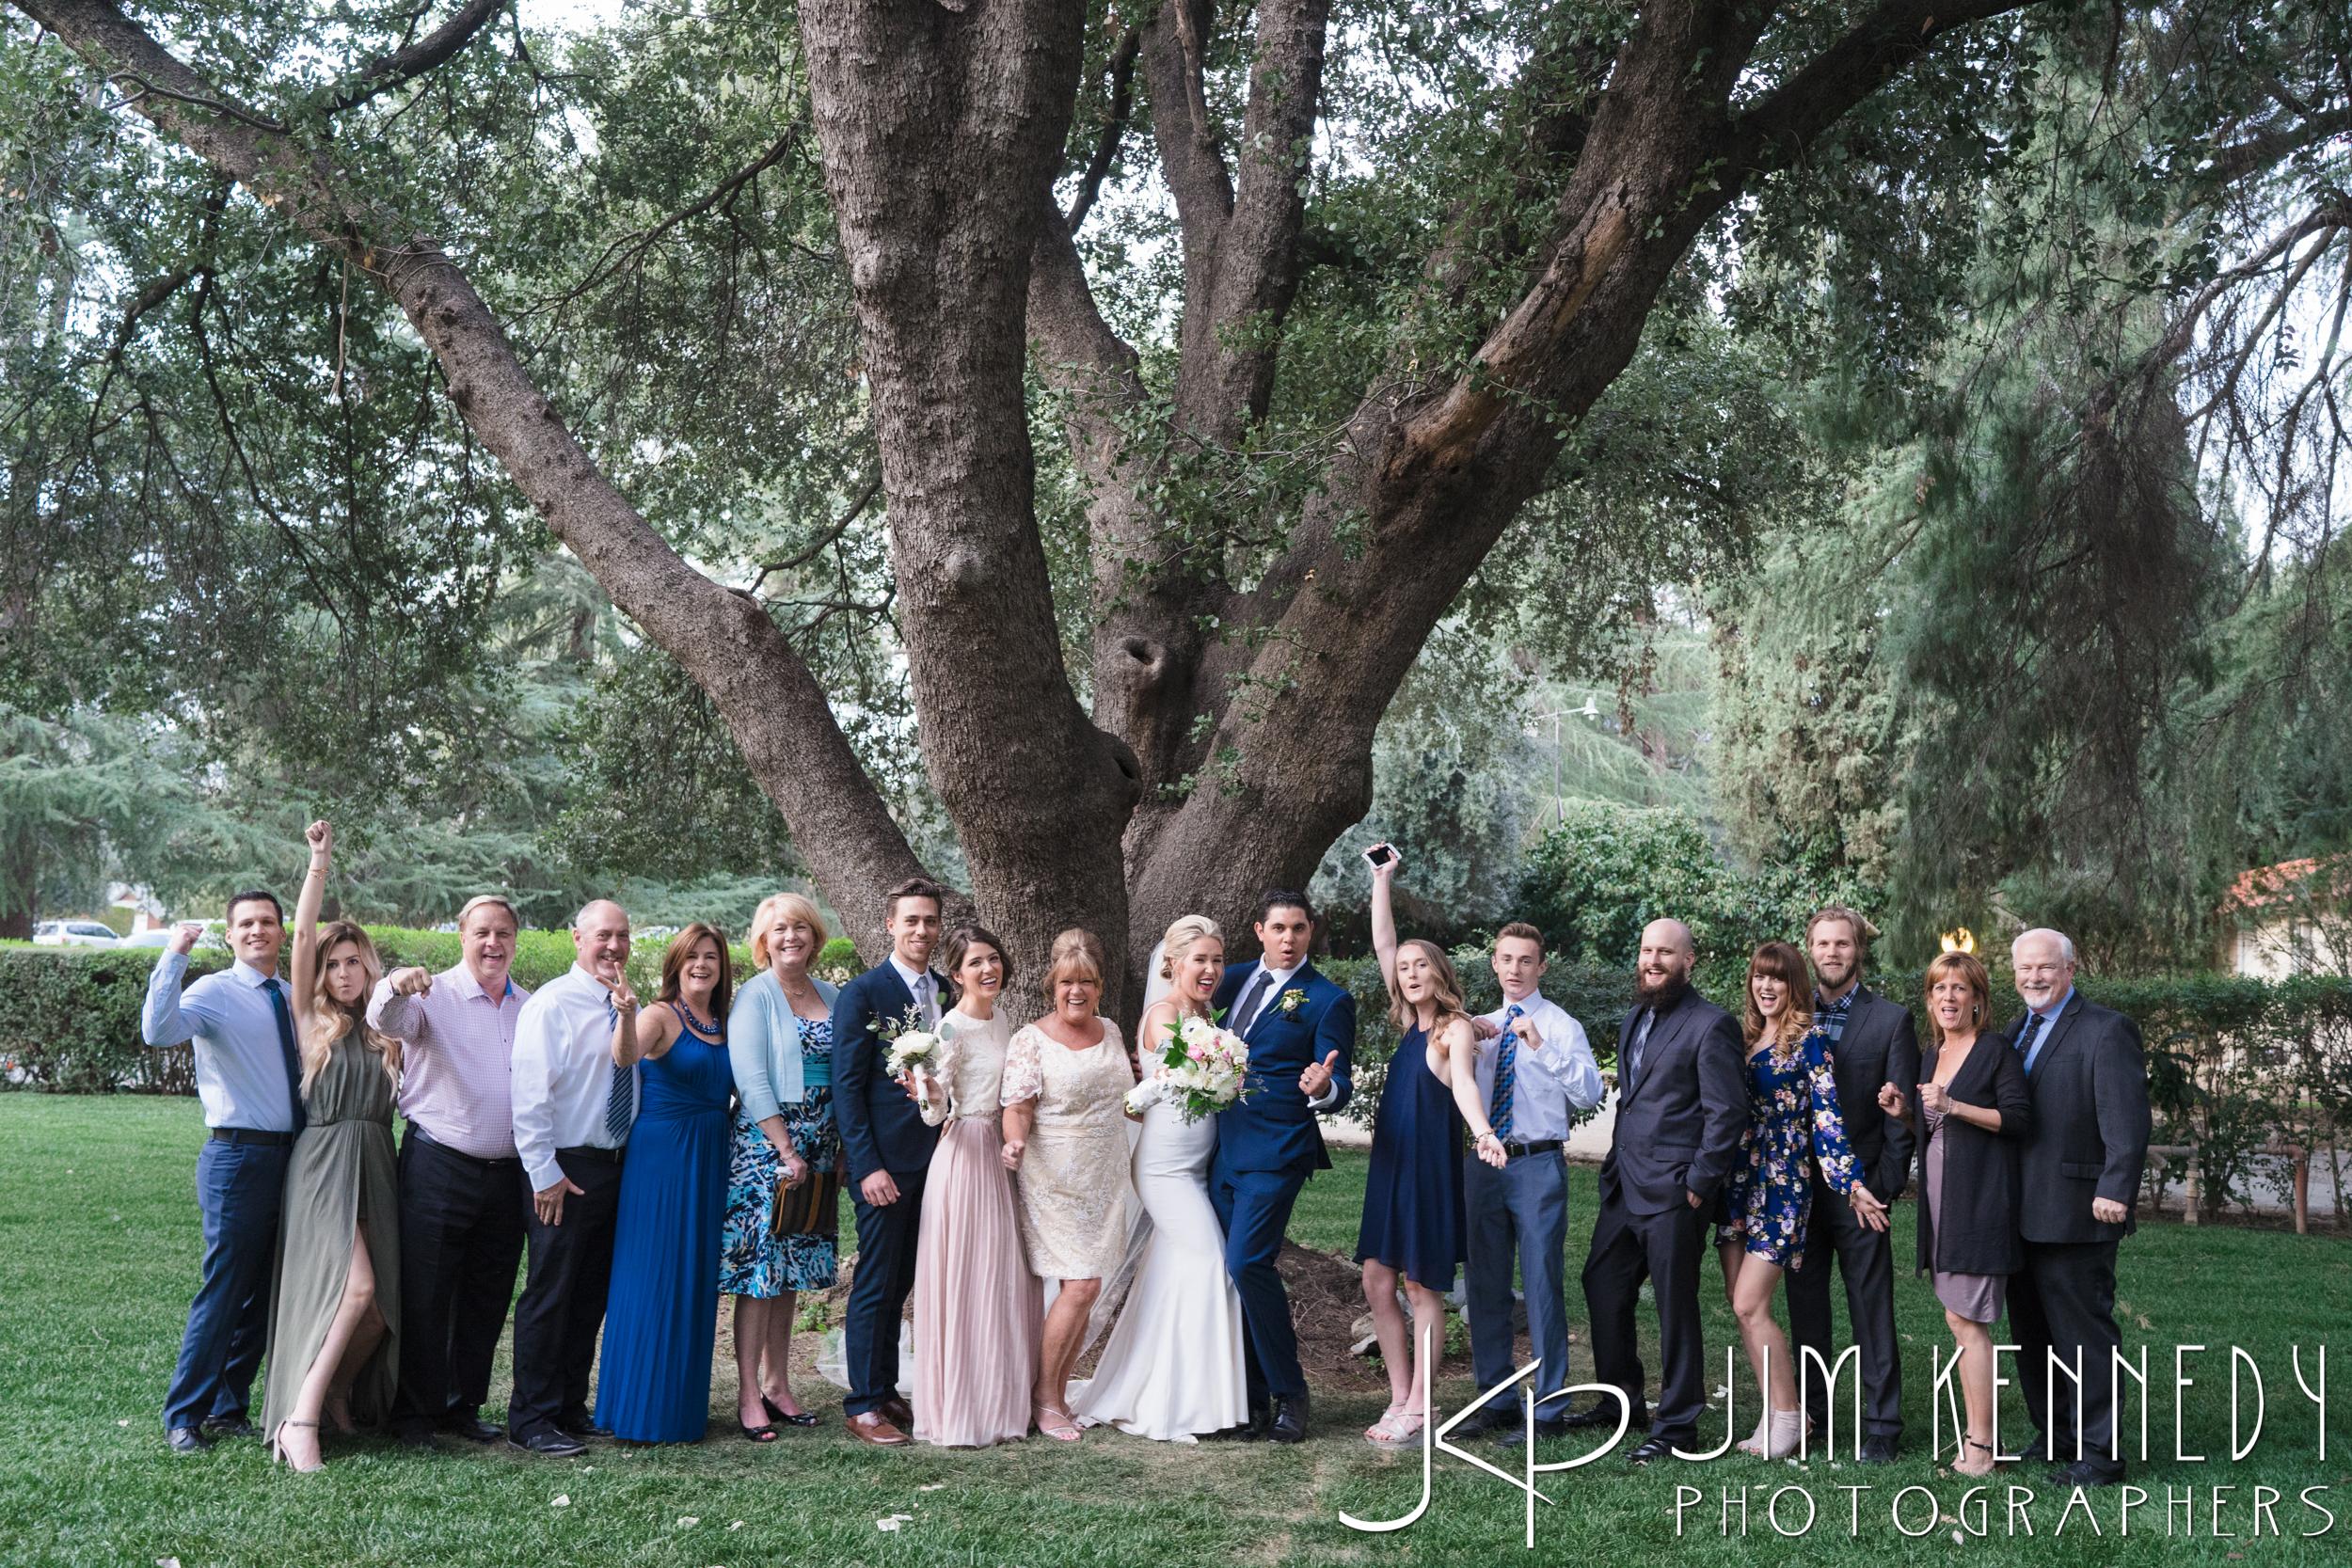 jim_kennedy_photographers_highland_springs_wedding_caitlyn_0129.jpg